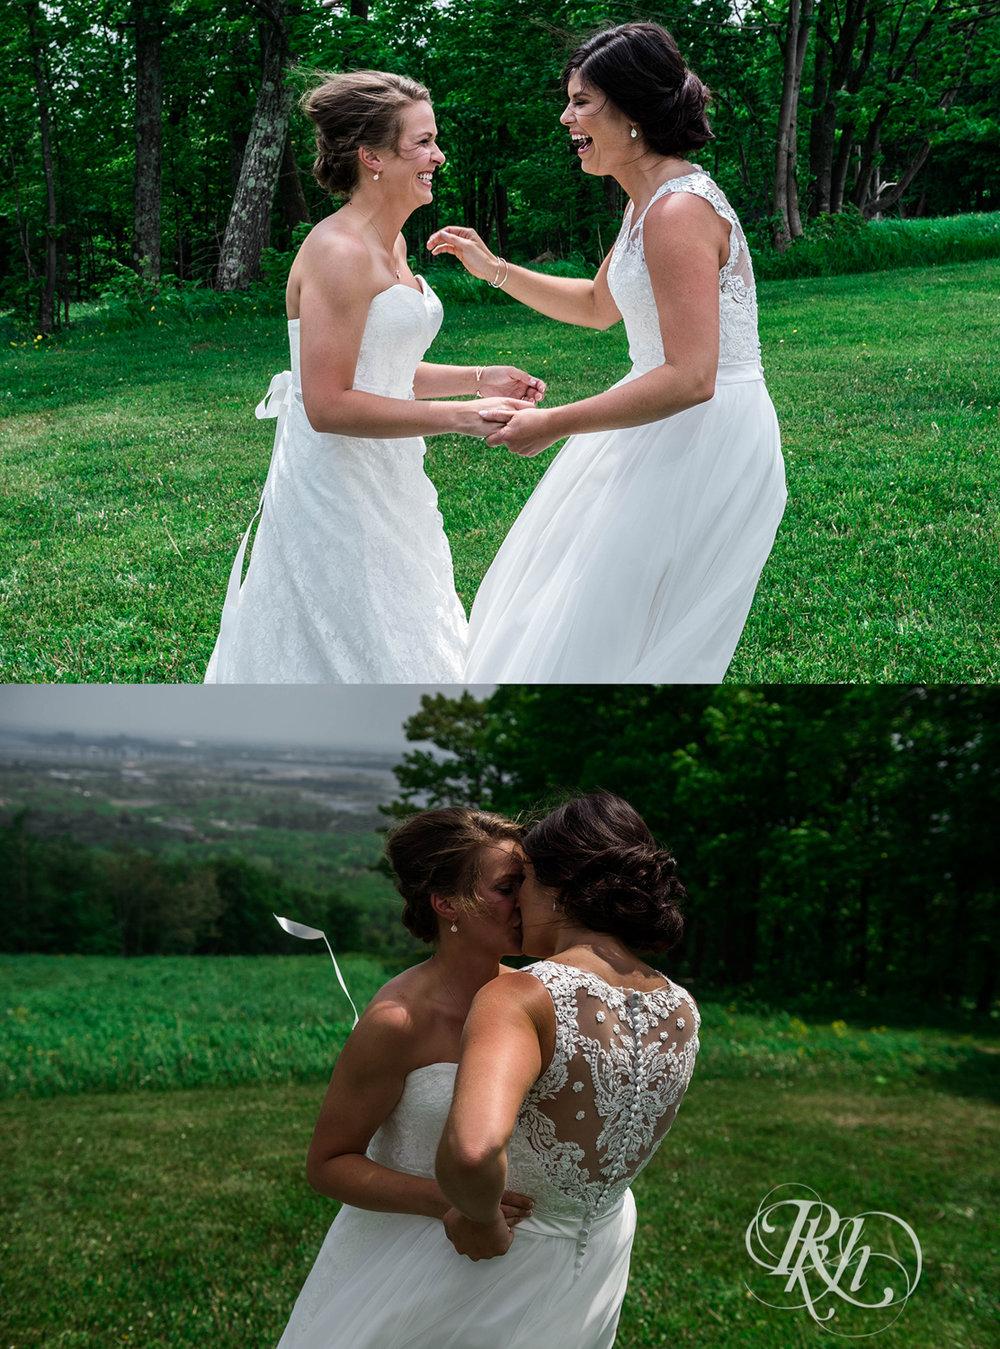 First Look - Minnesota Wedding Photography - RKH Images - Blog (1 of 3).jpg